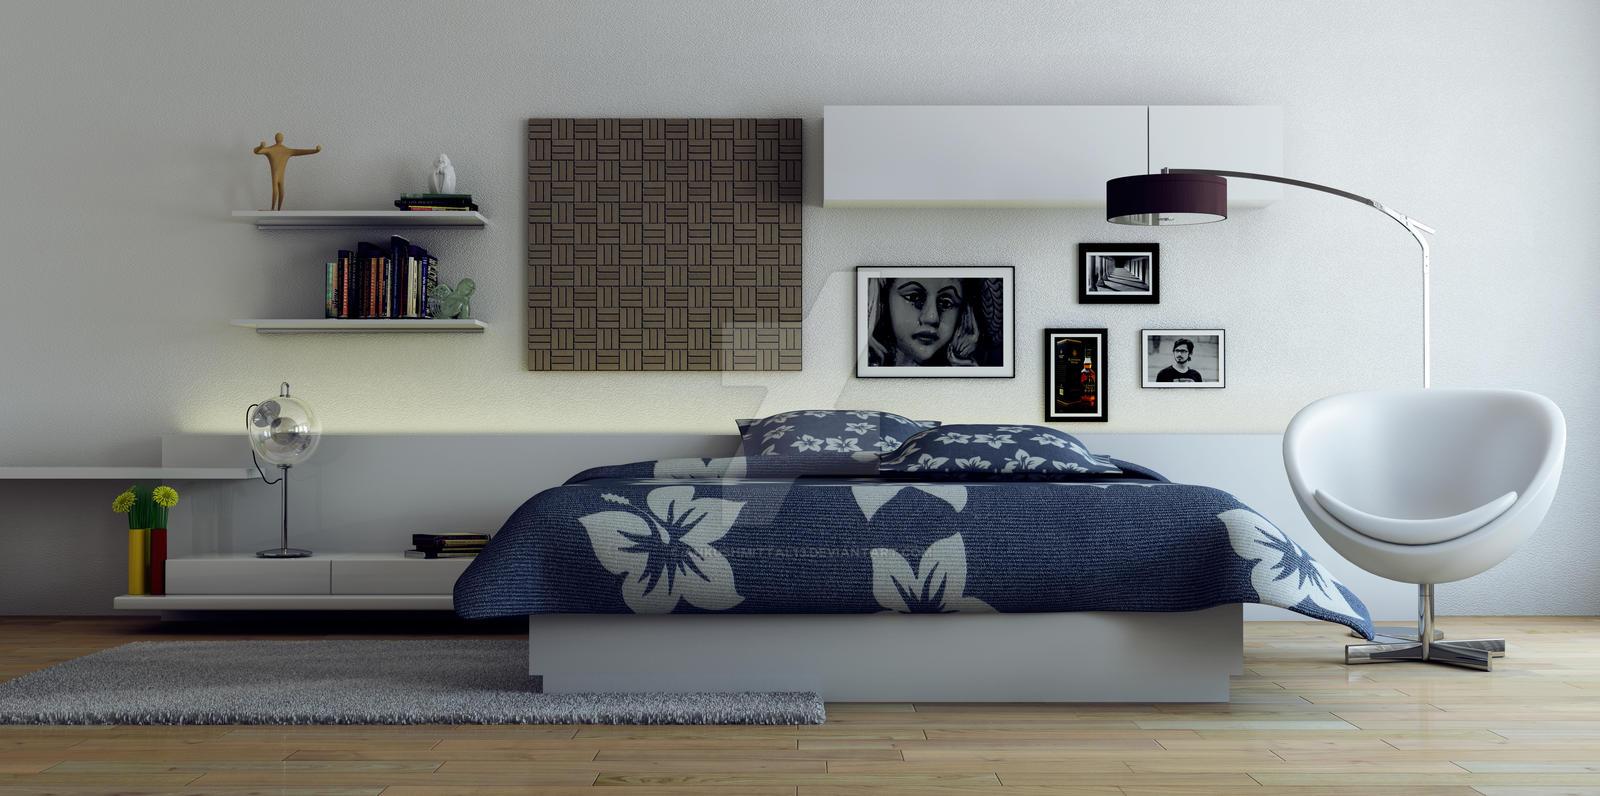 Simple Elegant Bedroom Simple And Elegant Bedroom Design By Ankushmittal13 On Deviantart